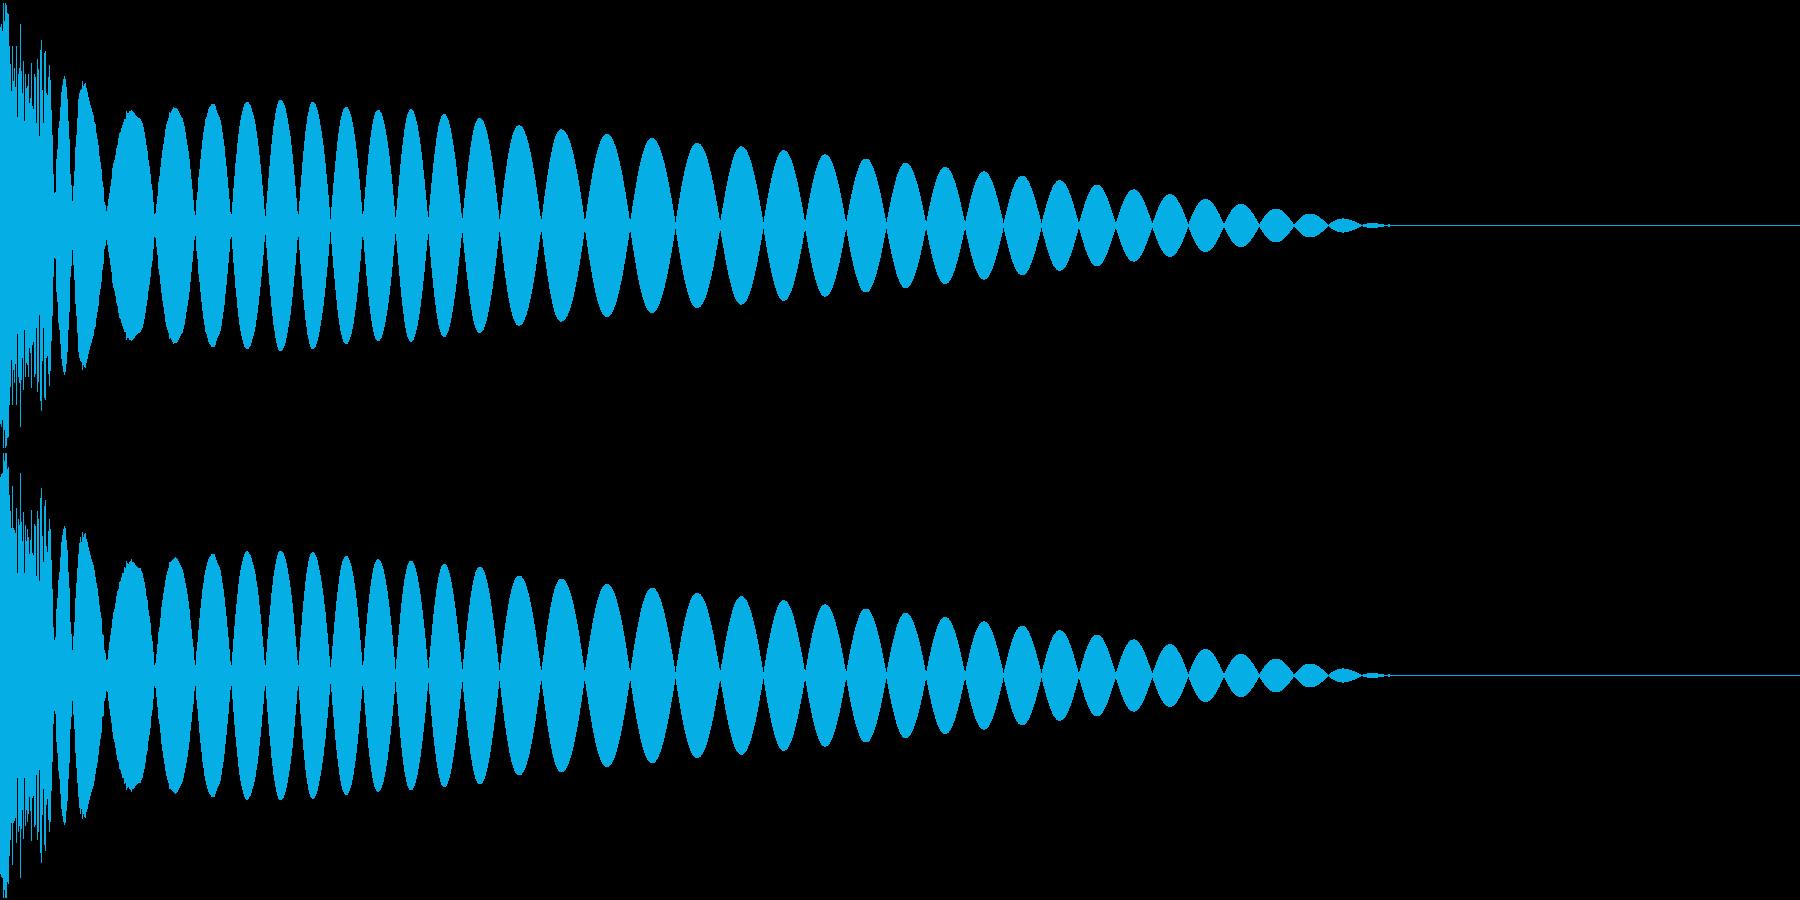 DTM Kick 13 オリジナル音源の再生済みの波形